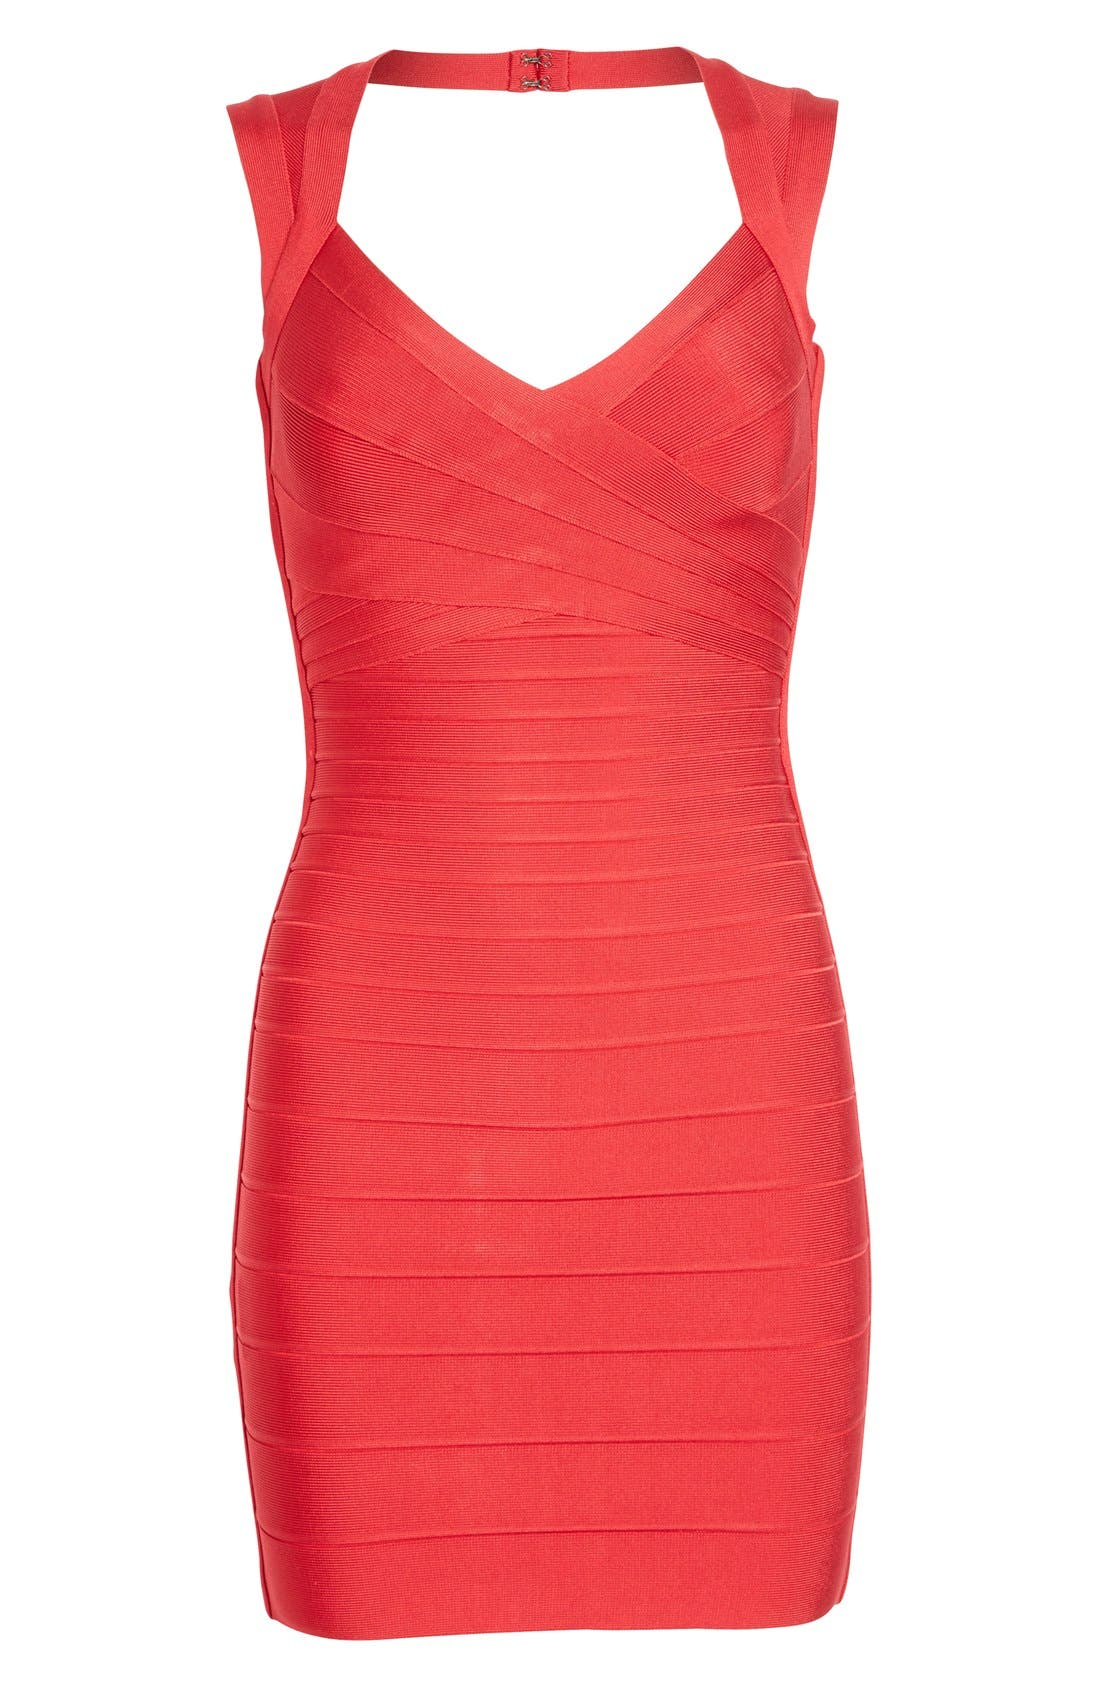 HERVE LEGER,                             Open Back Bandage Dress,                             Alternate thumbnail 4, color,                             616